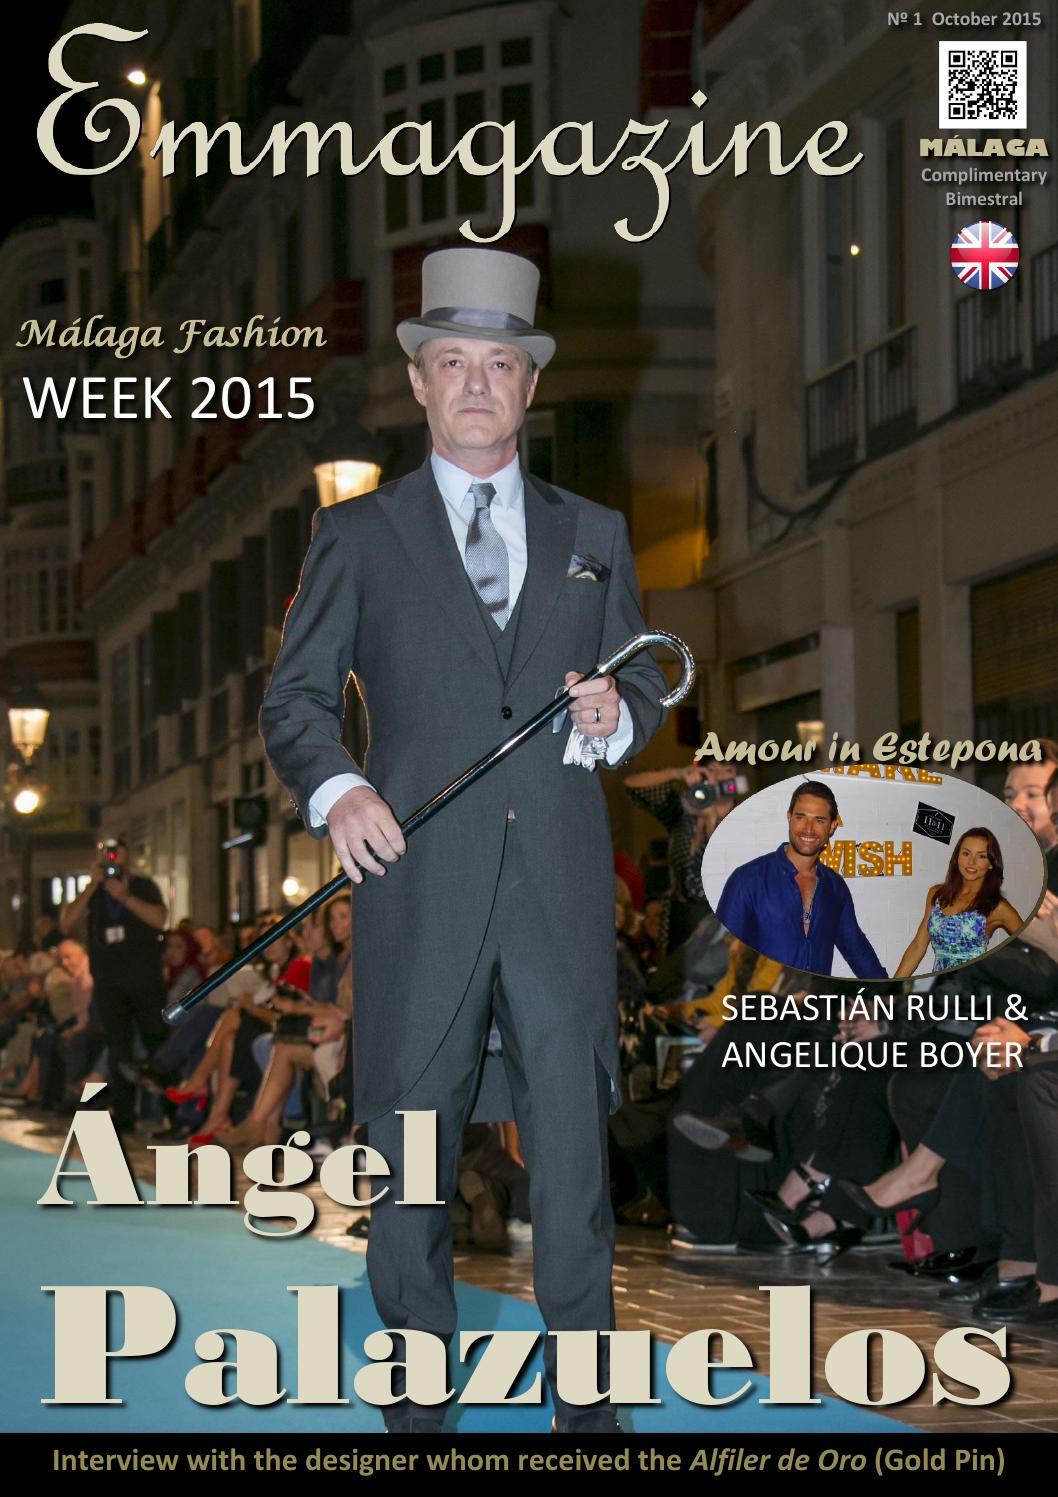 Angelique Boyer Movies And Tv Shows emmagazine nº 1 englisheventemmalaga - issuu